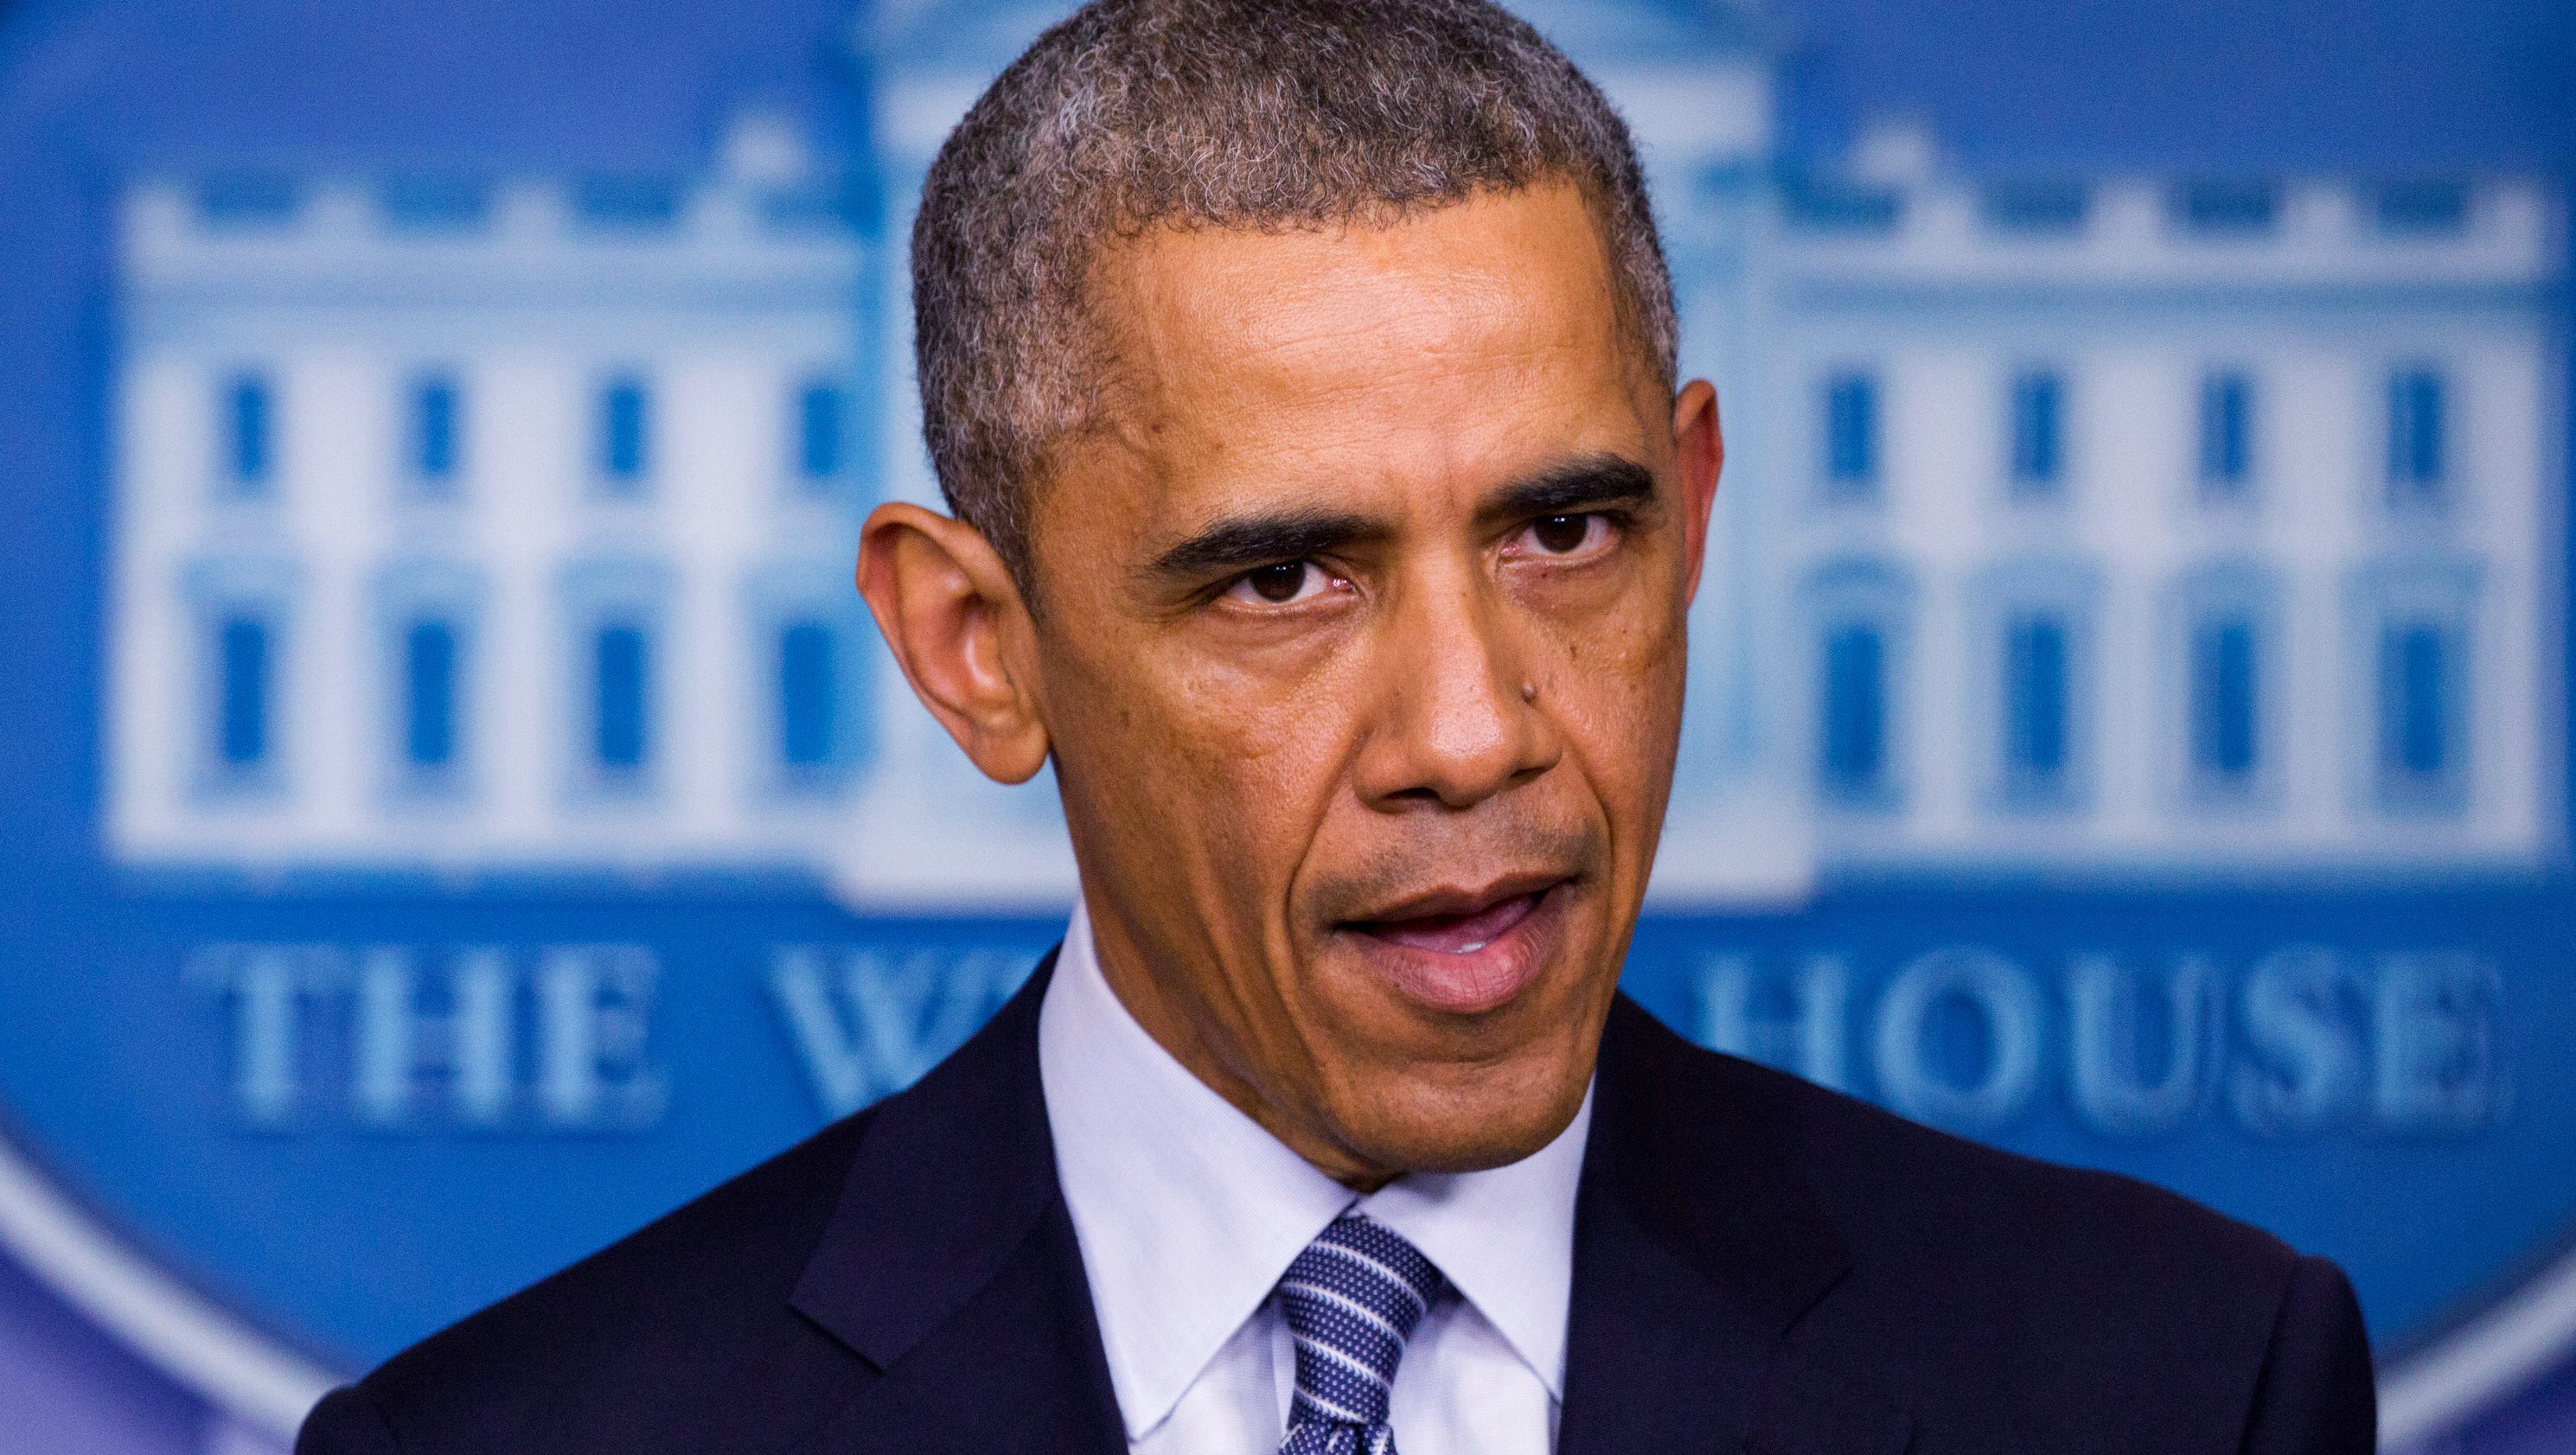 Obama's biggest frustration: Gun control